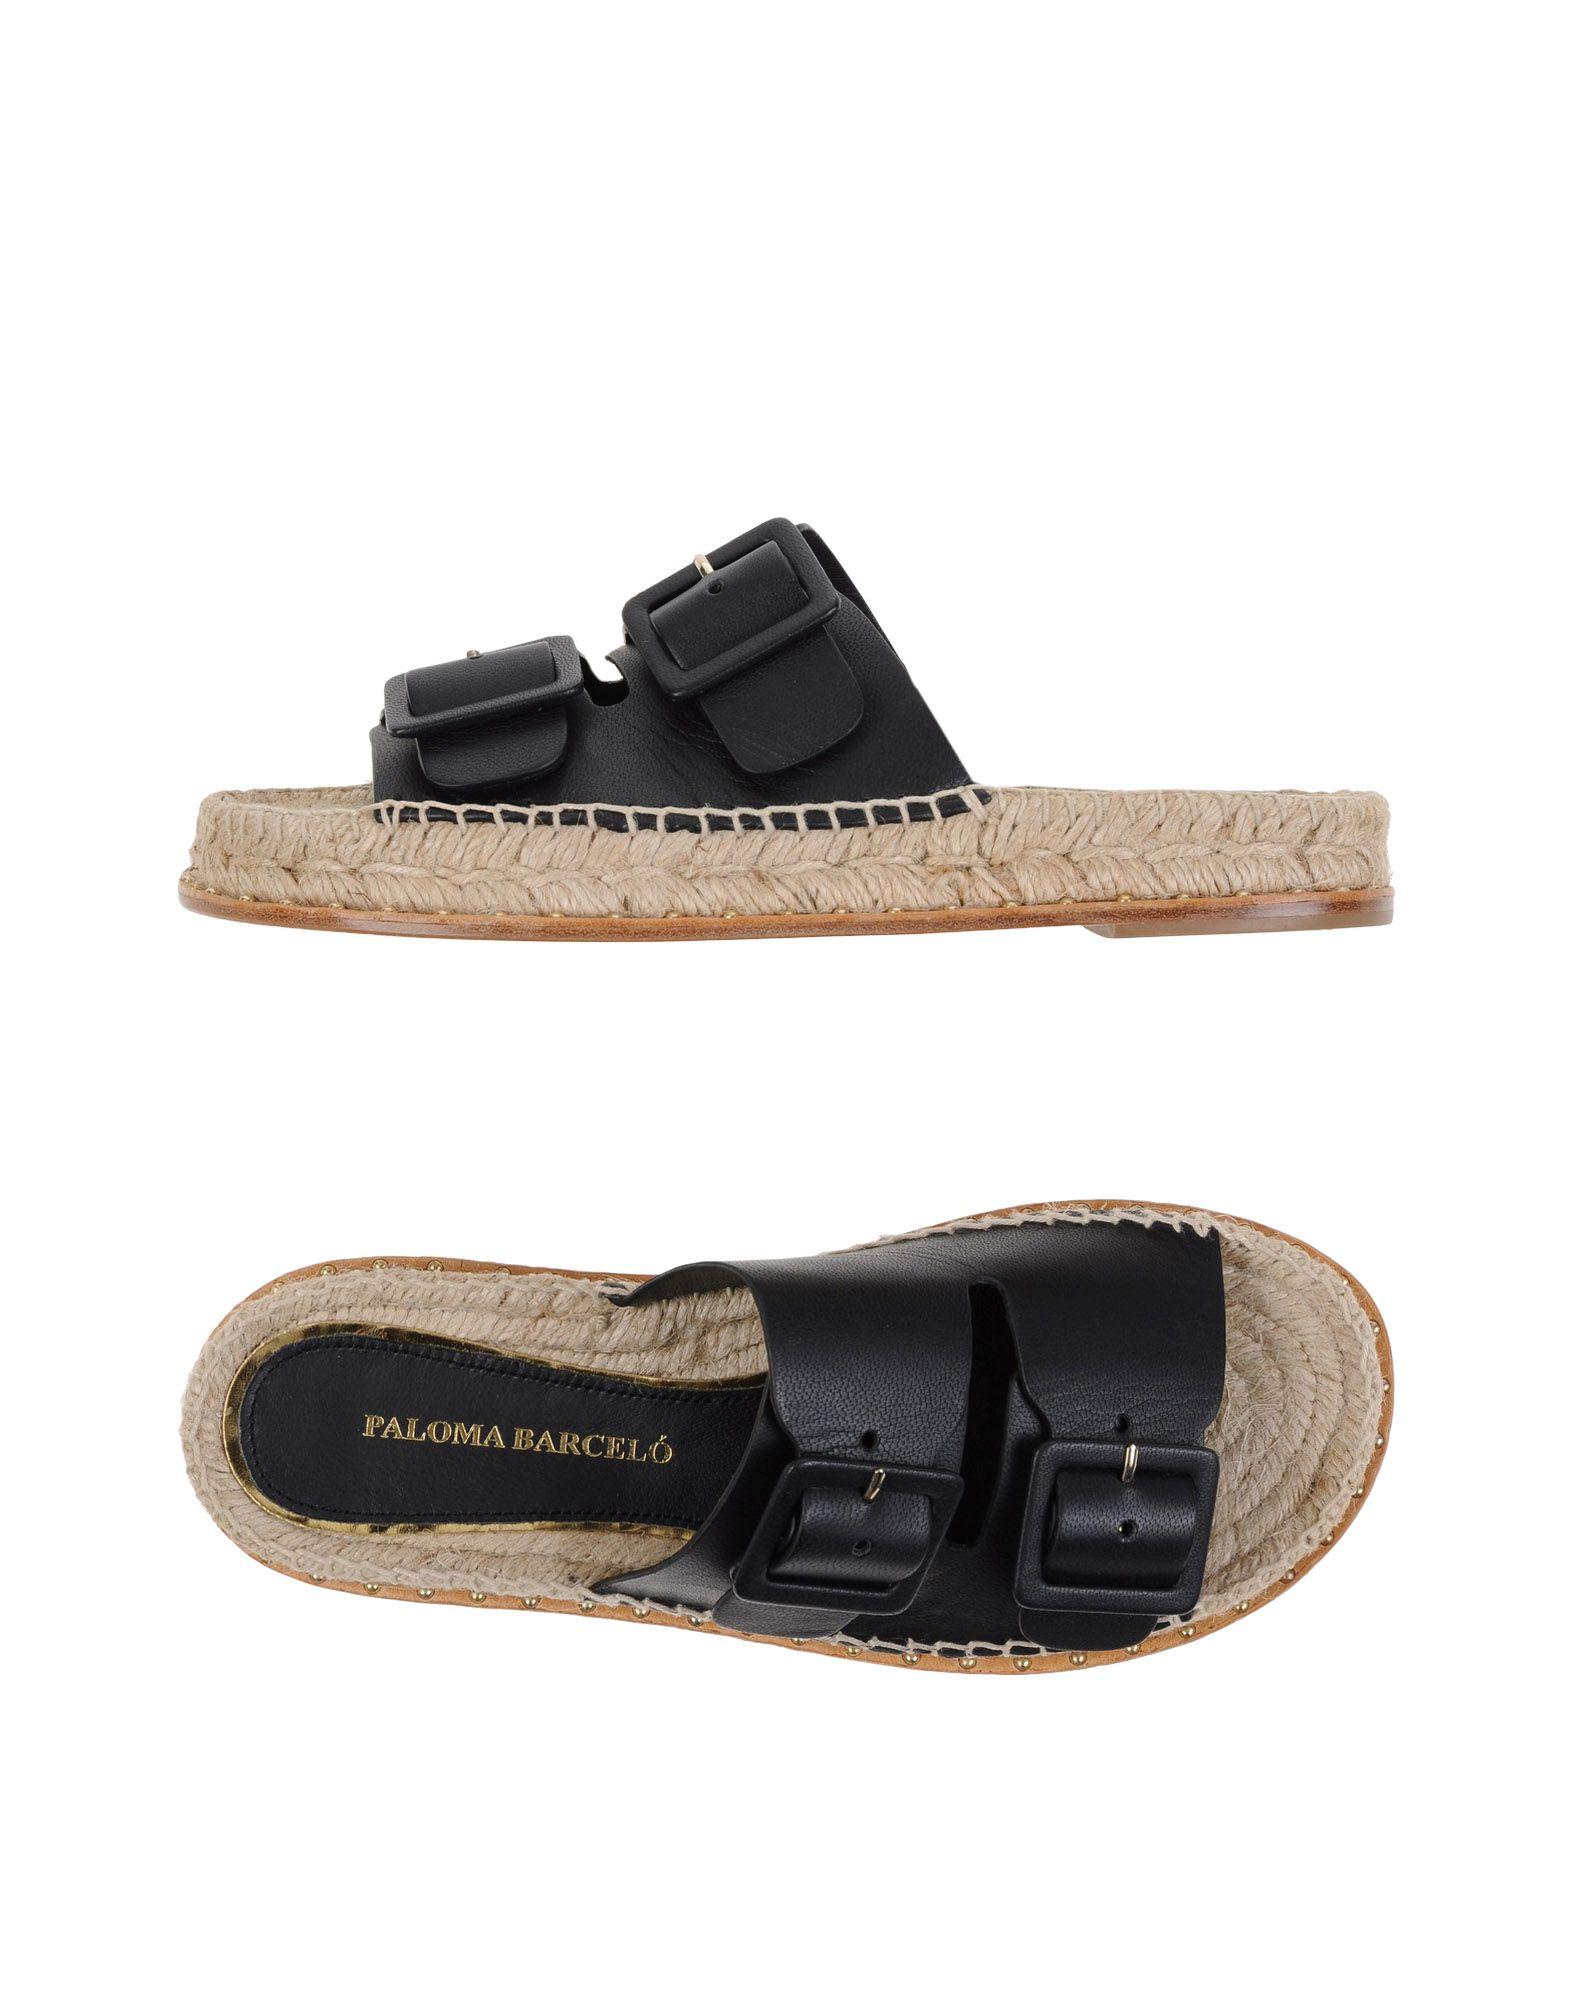 Stilvolle Barceló billige Schuhe Paloma Barceló Stilvolle Espadrilles Damen  11103617MR 31b6cf